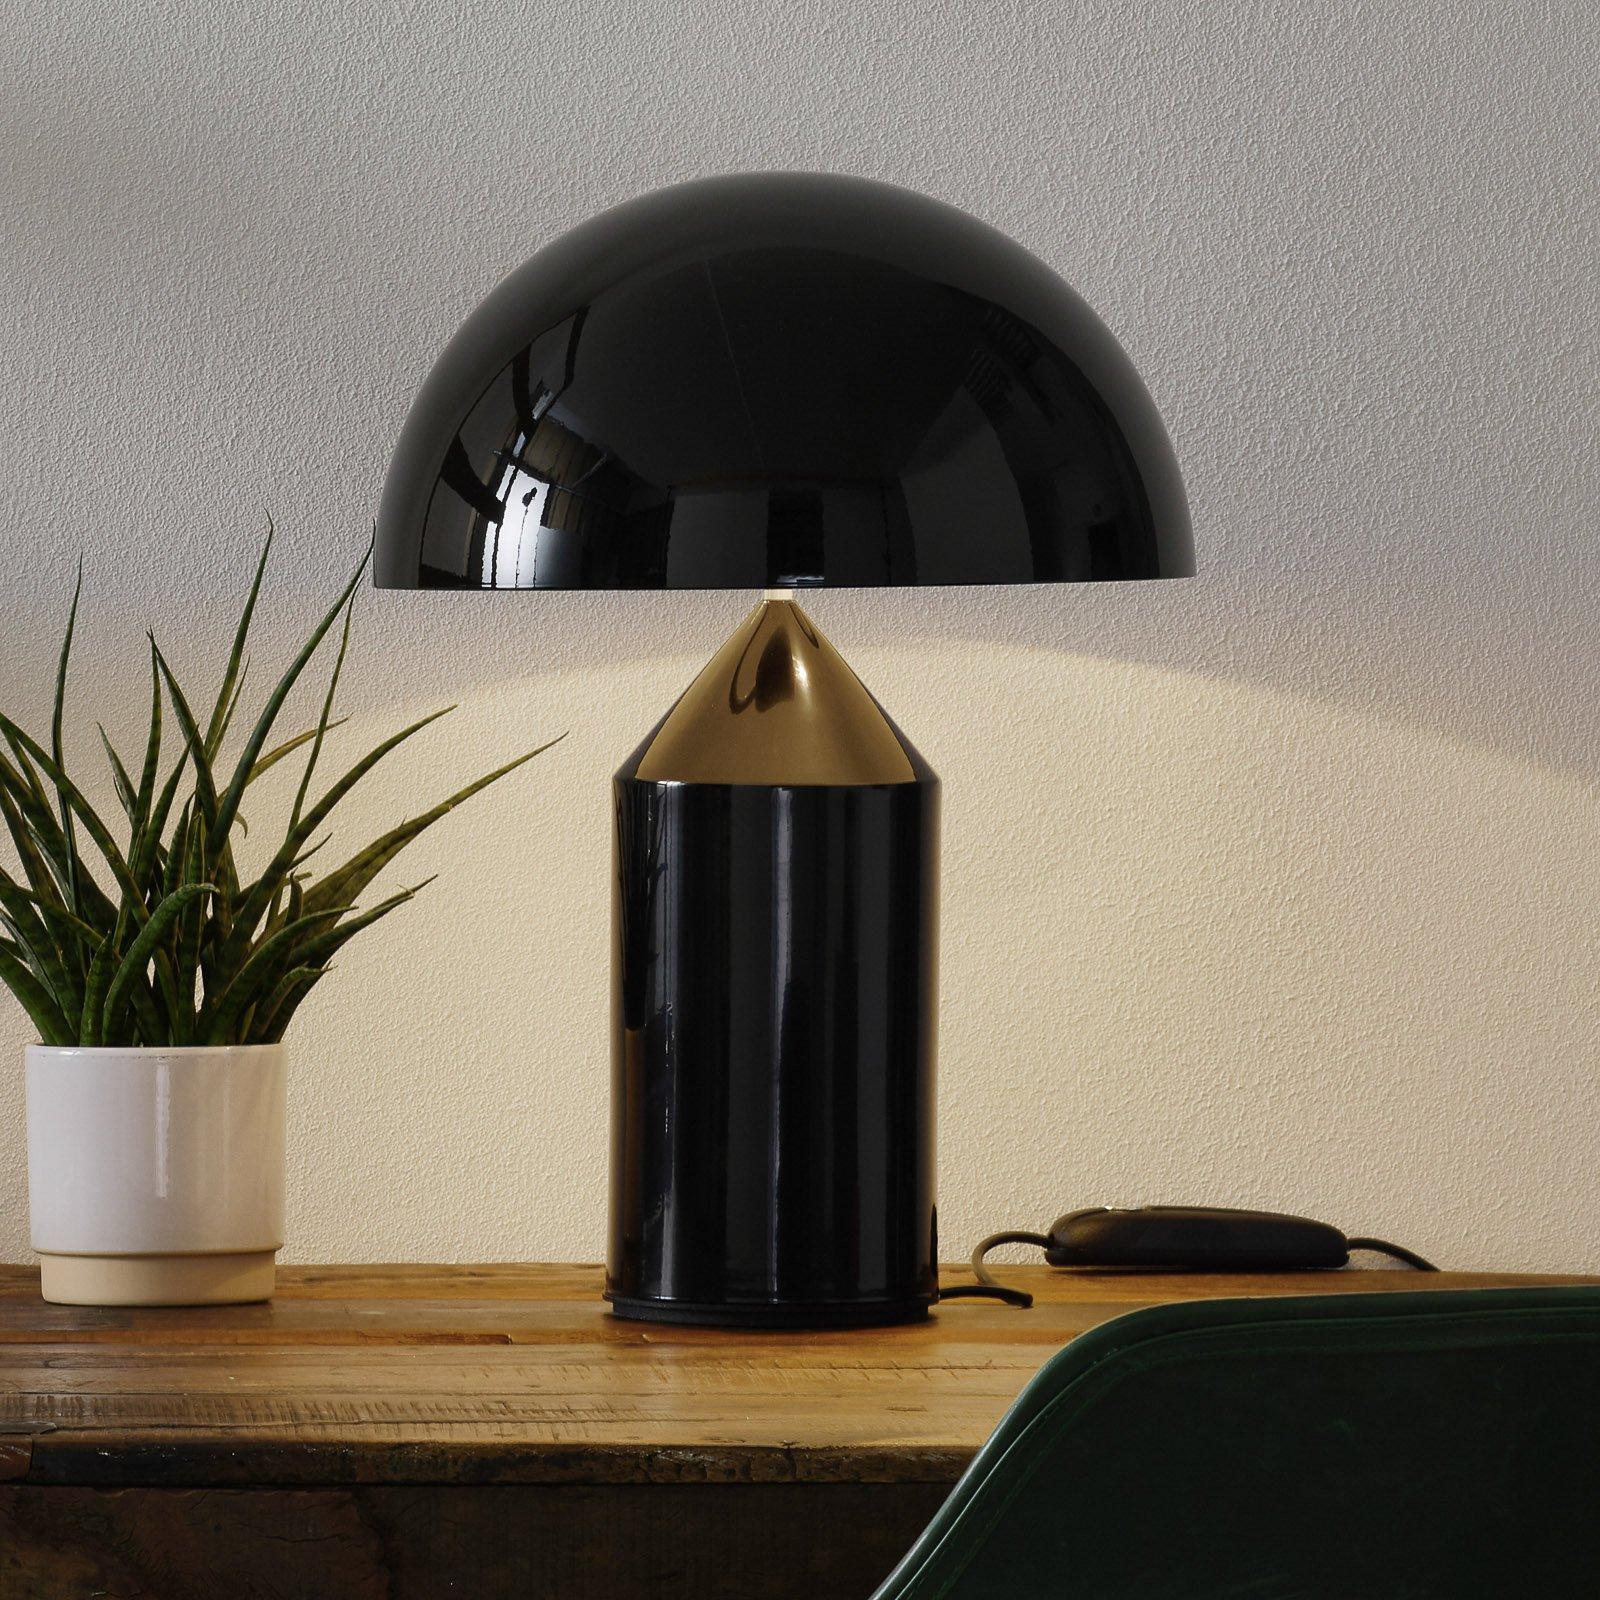 Oluce Atollo - stilig designer-bordlampe, svart